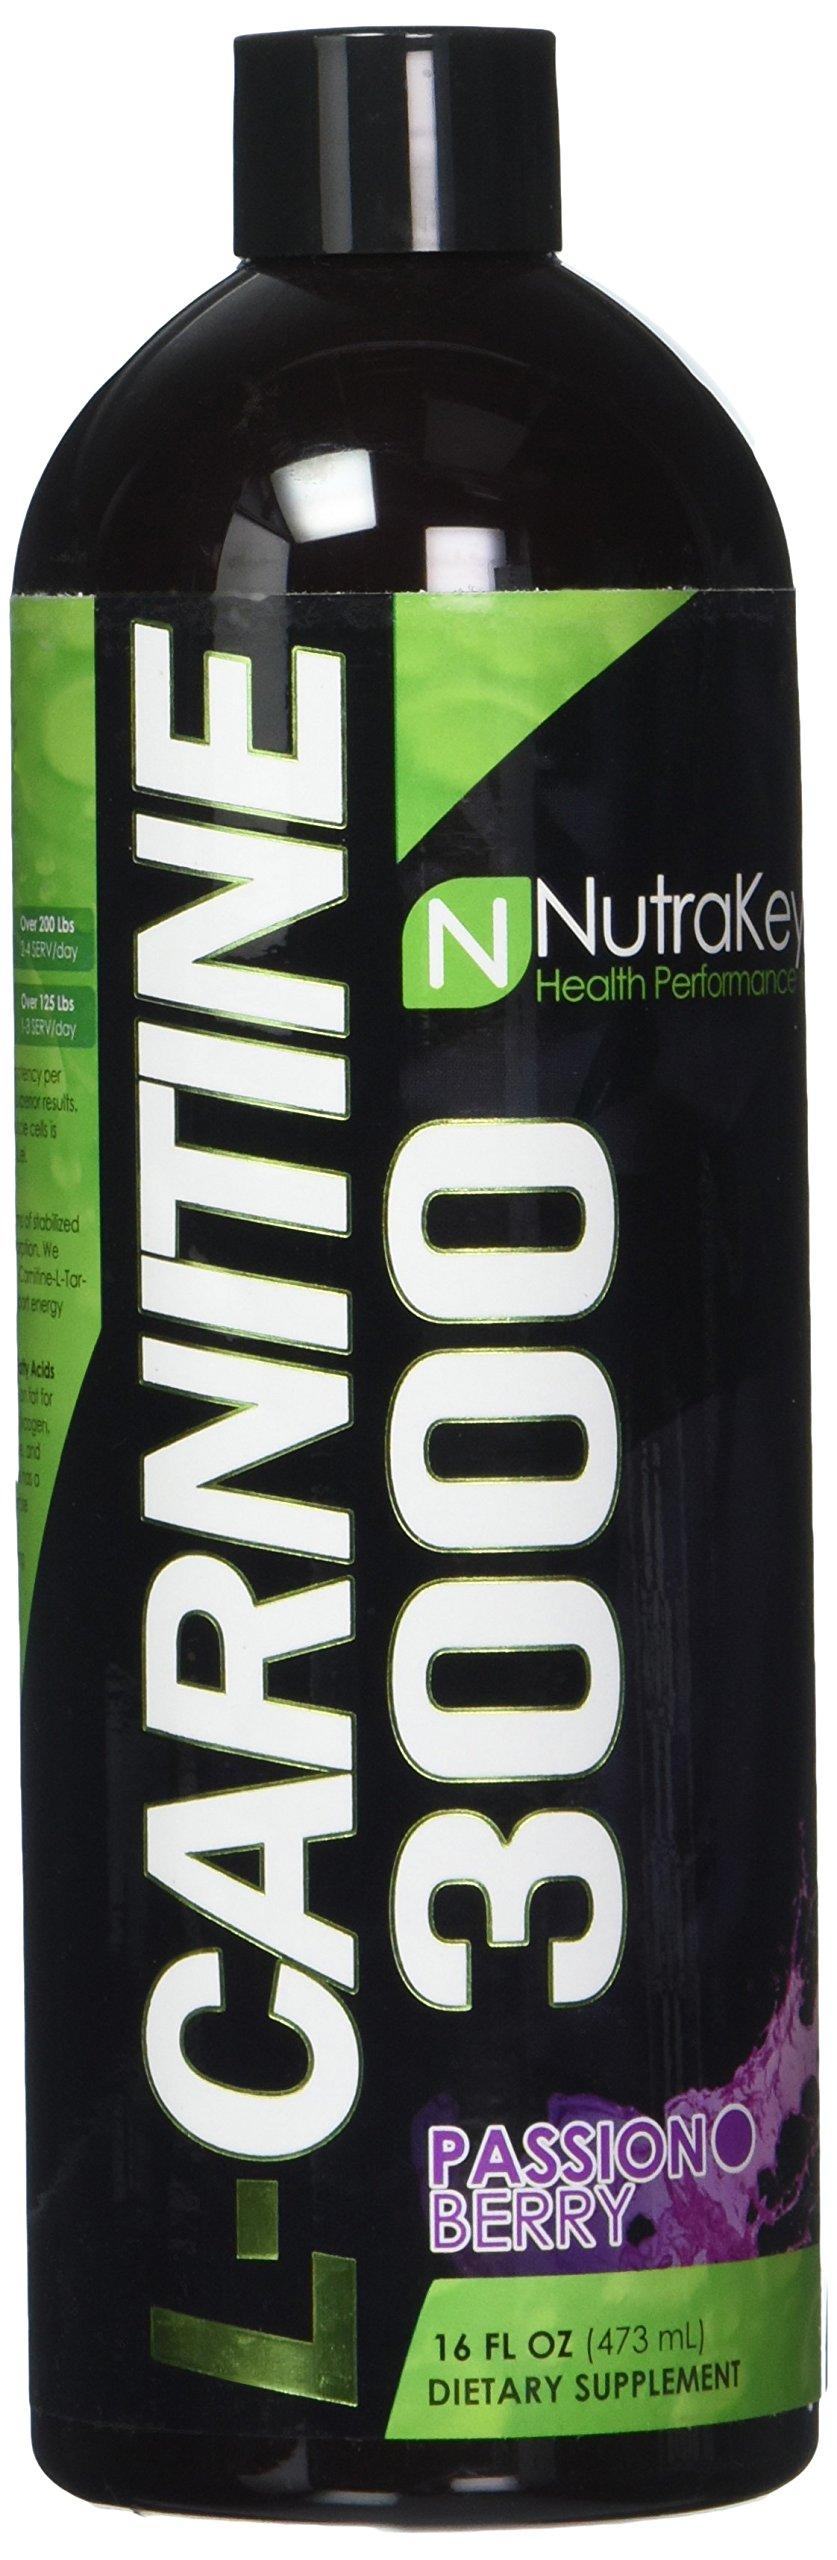 NutraKey L-Carnitine 3000 Liquid Fat Burner, Passion Berry, 31-Servings